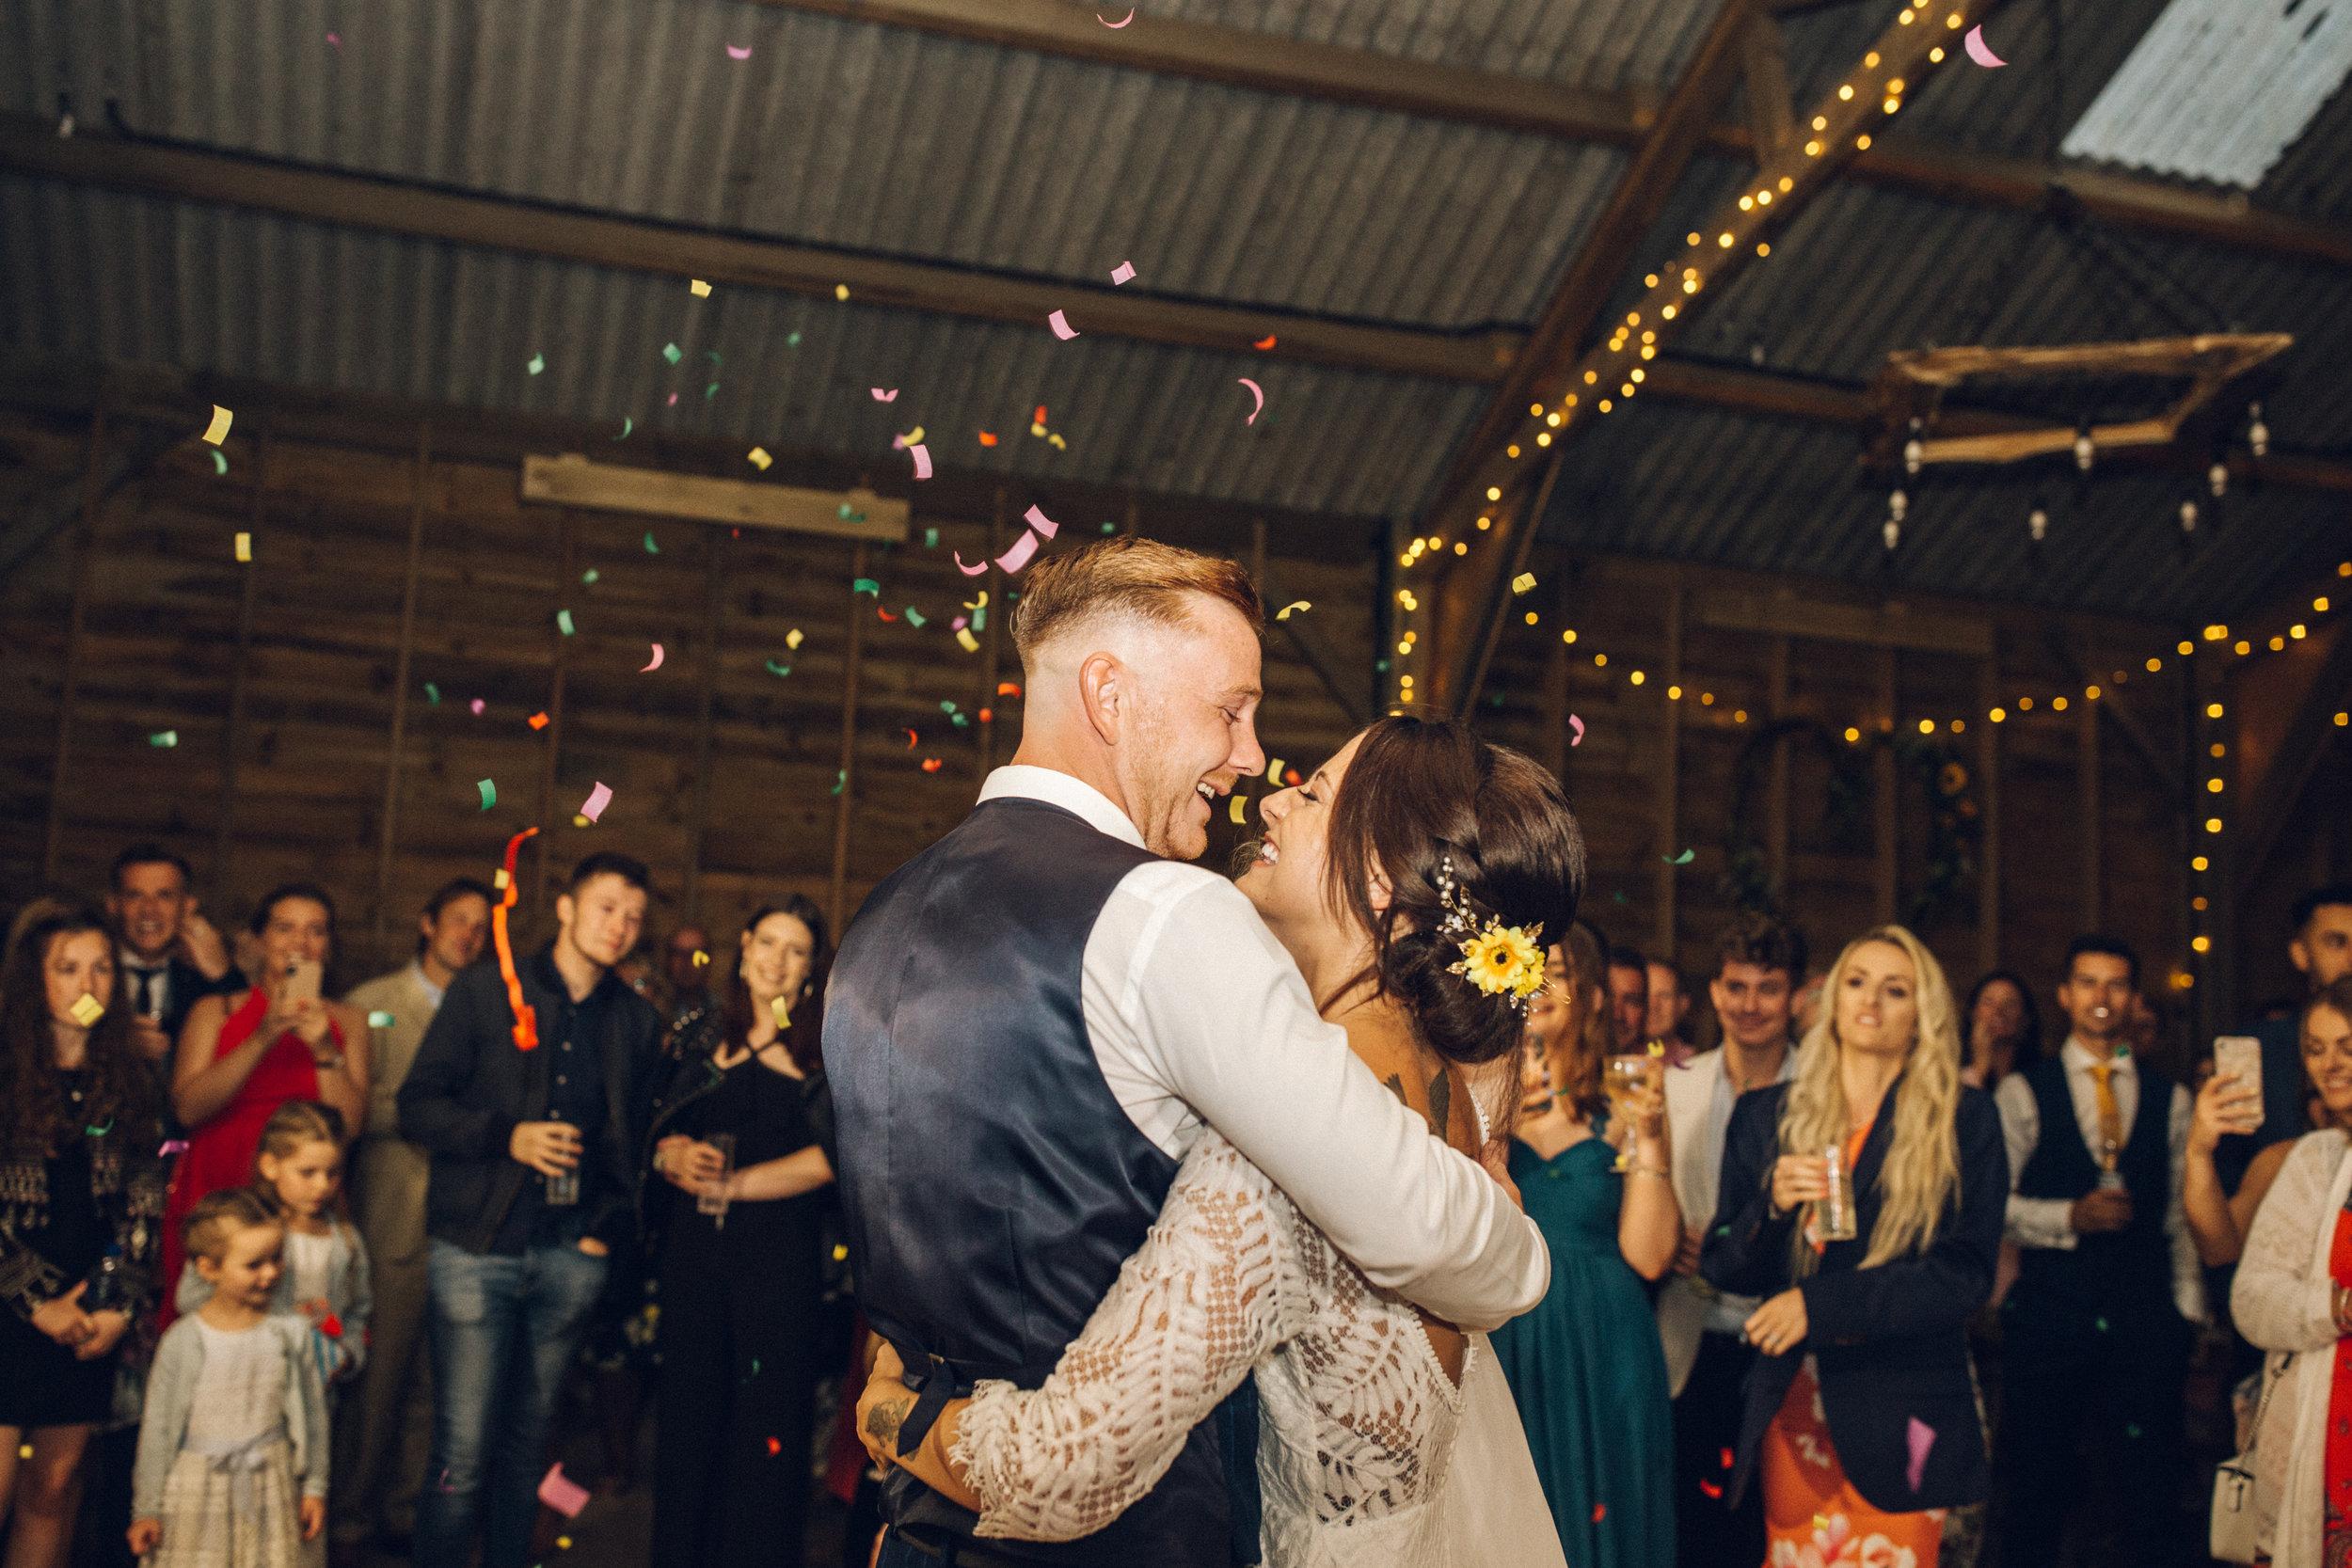 Captains Wood Barn Woodland Wedding Venue in Maldon Essex